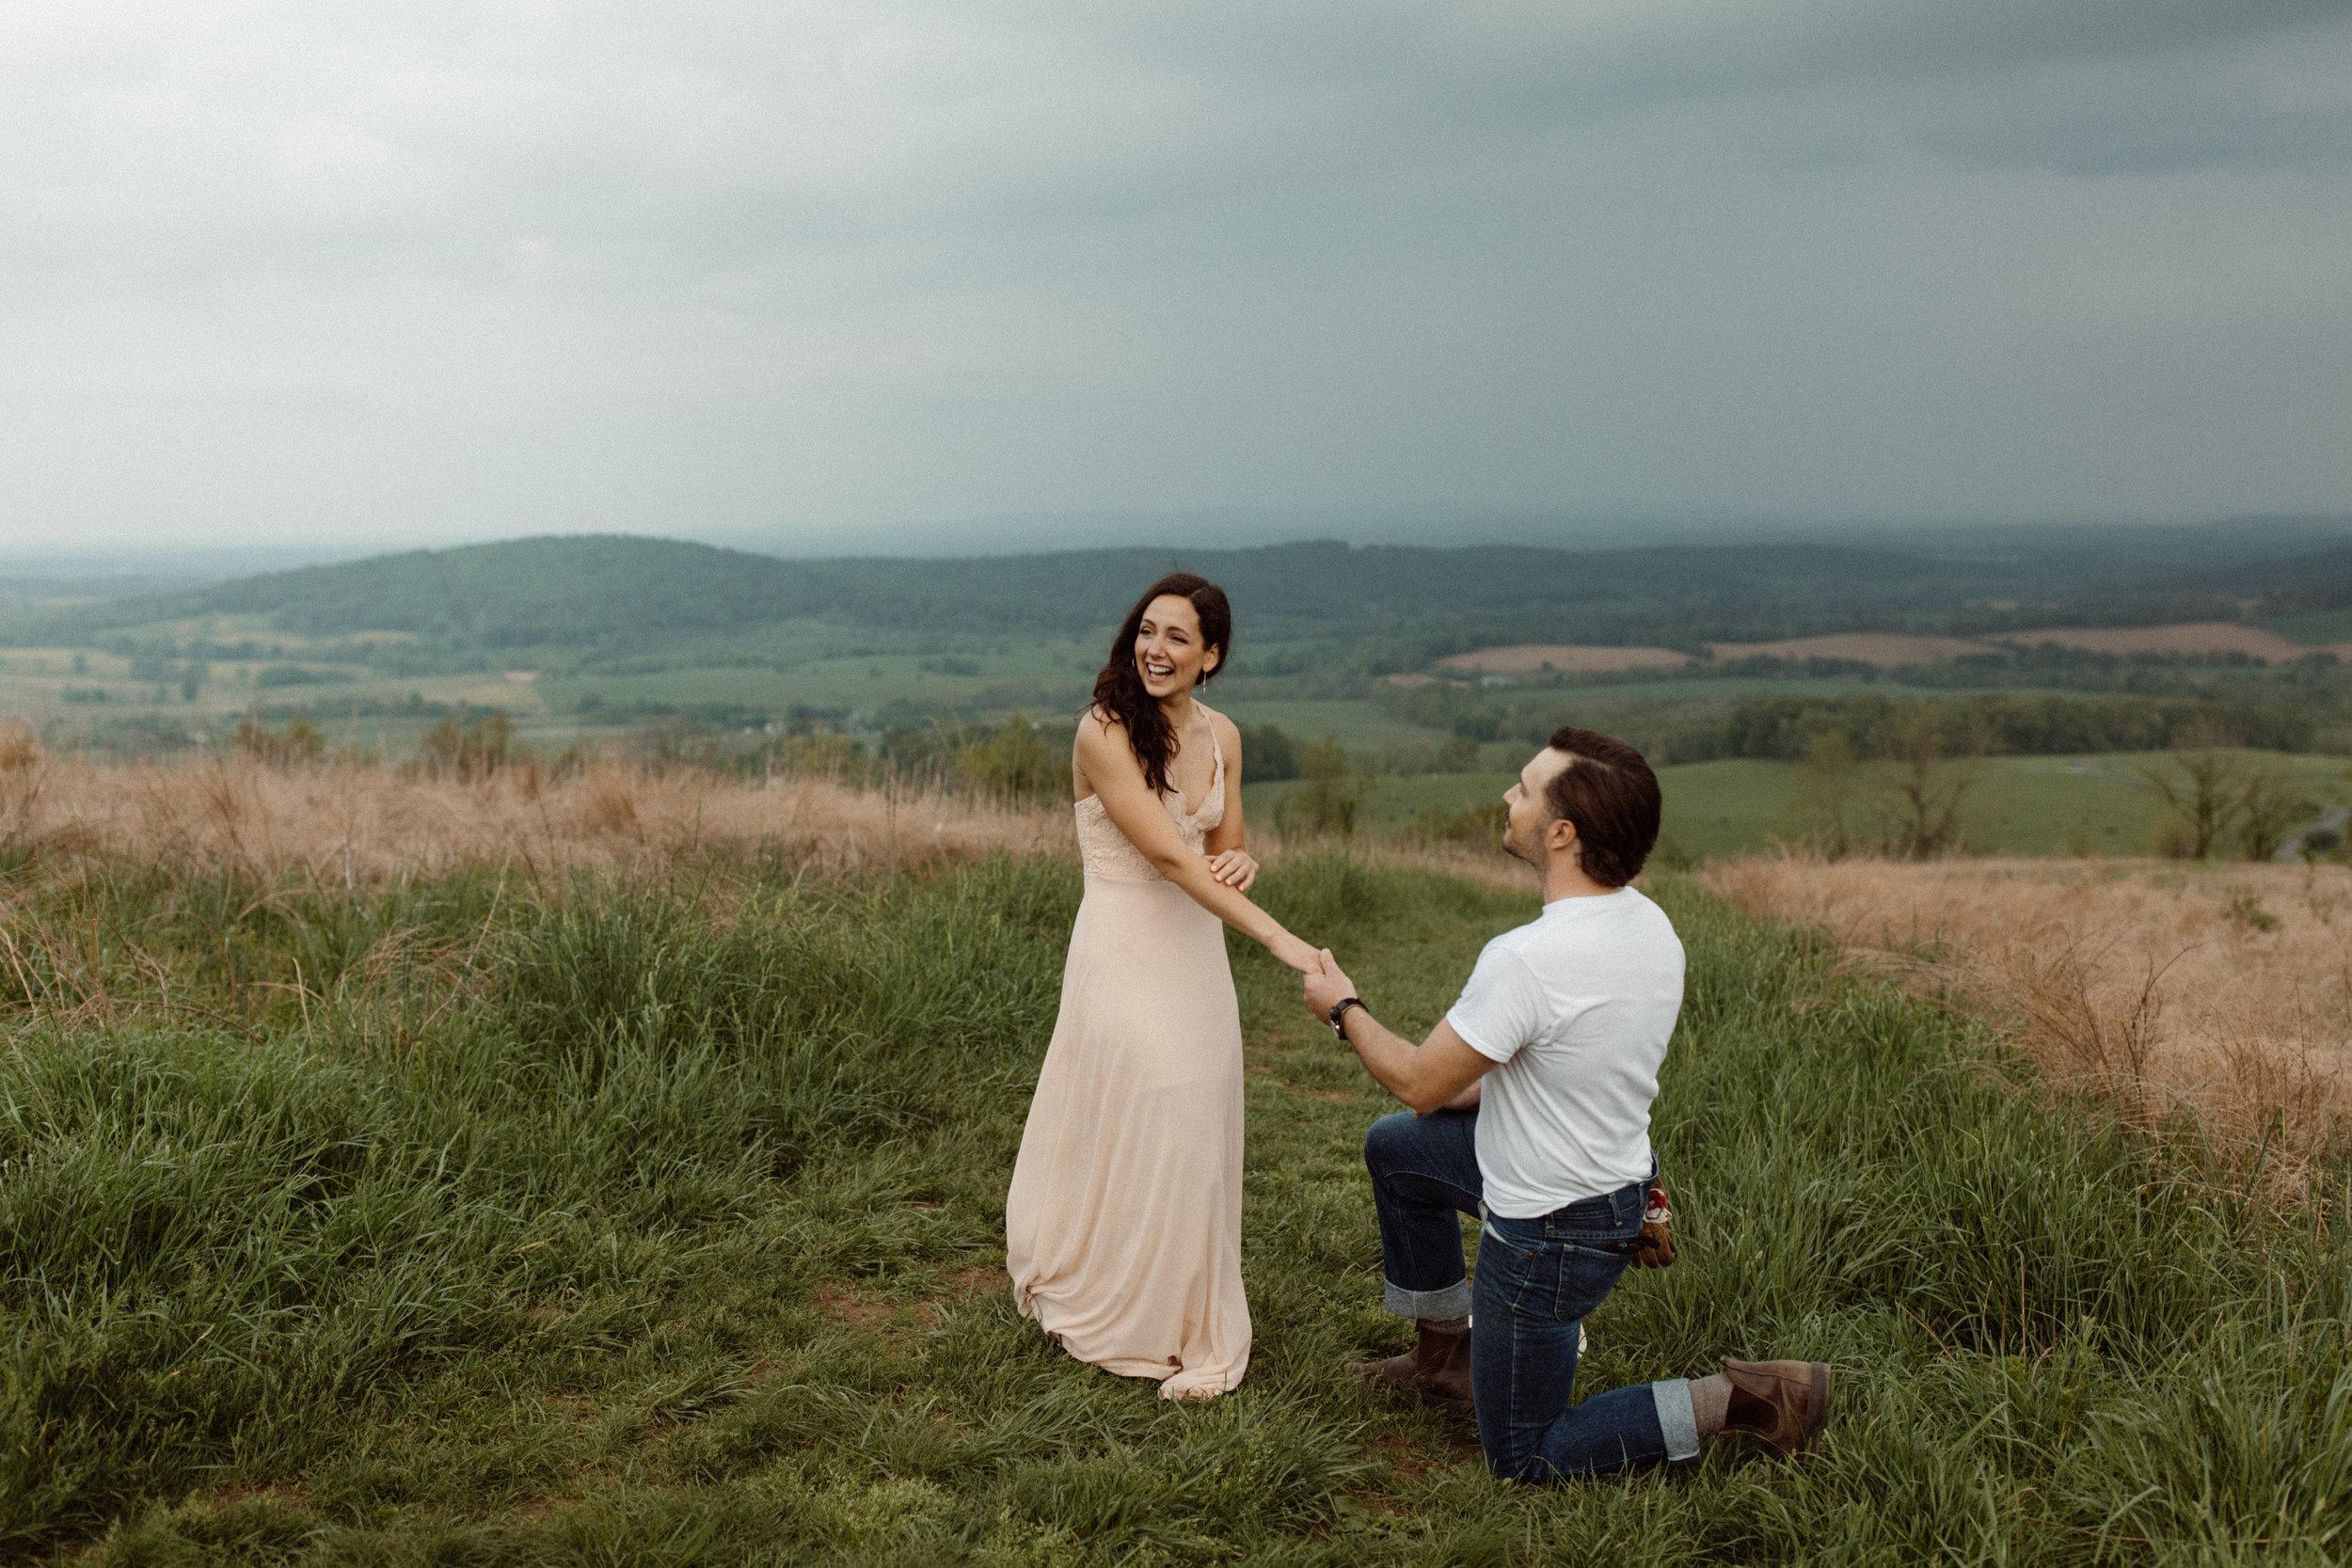 kelsey&mark-engagement-skymeadows-2019-peytoncurry-9776.jpg